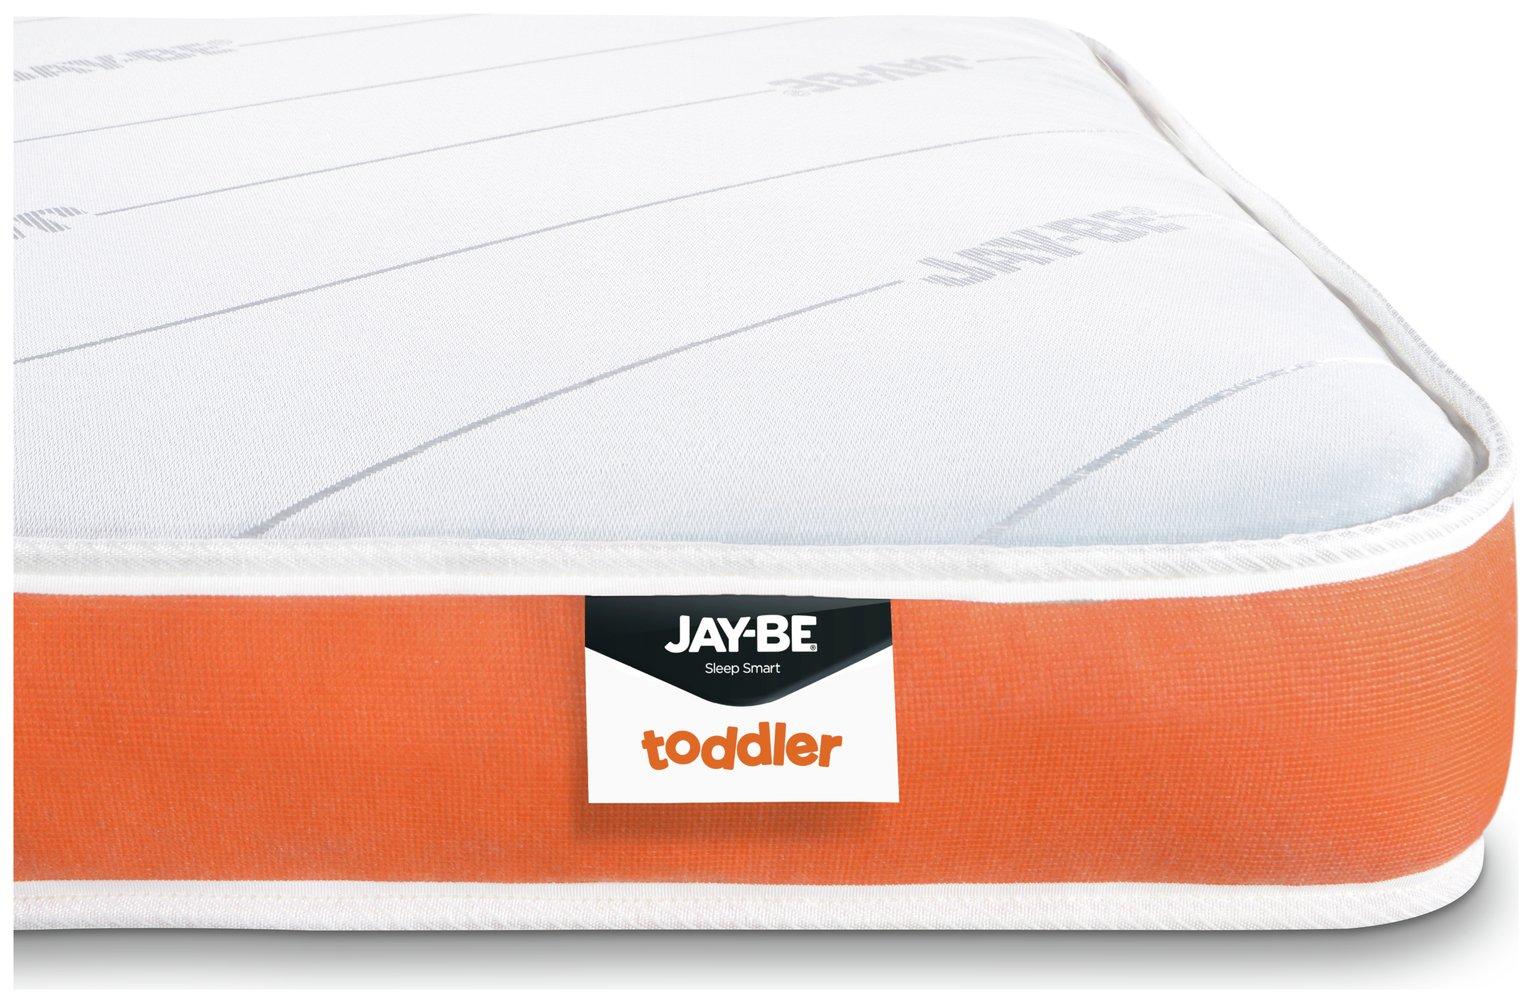 Jay Be Mattresses Compare Amp Buy Online Mattress Chooser